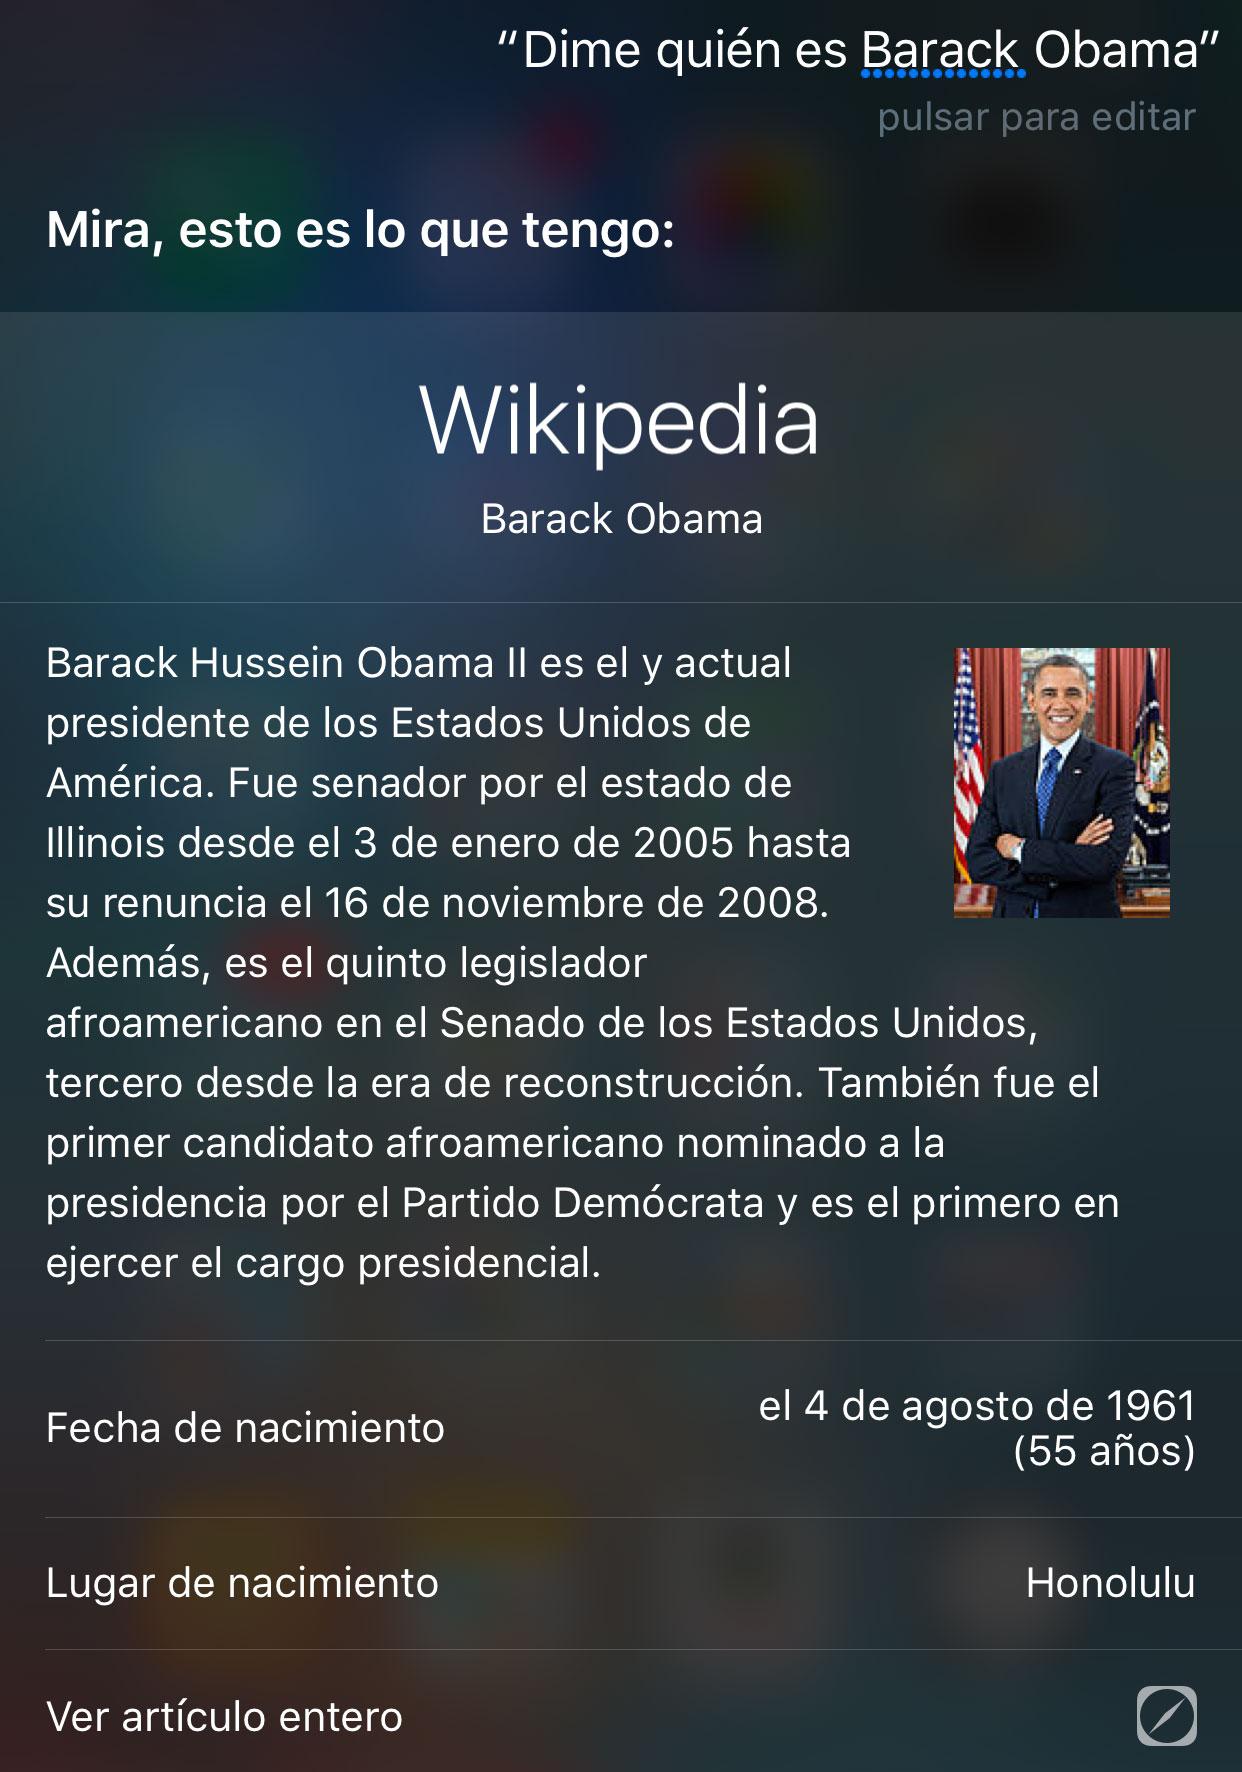 Preguntando a Siri quién es Barack Obama